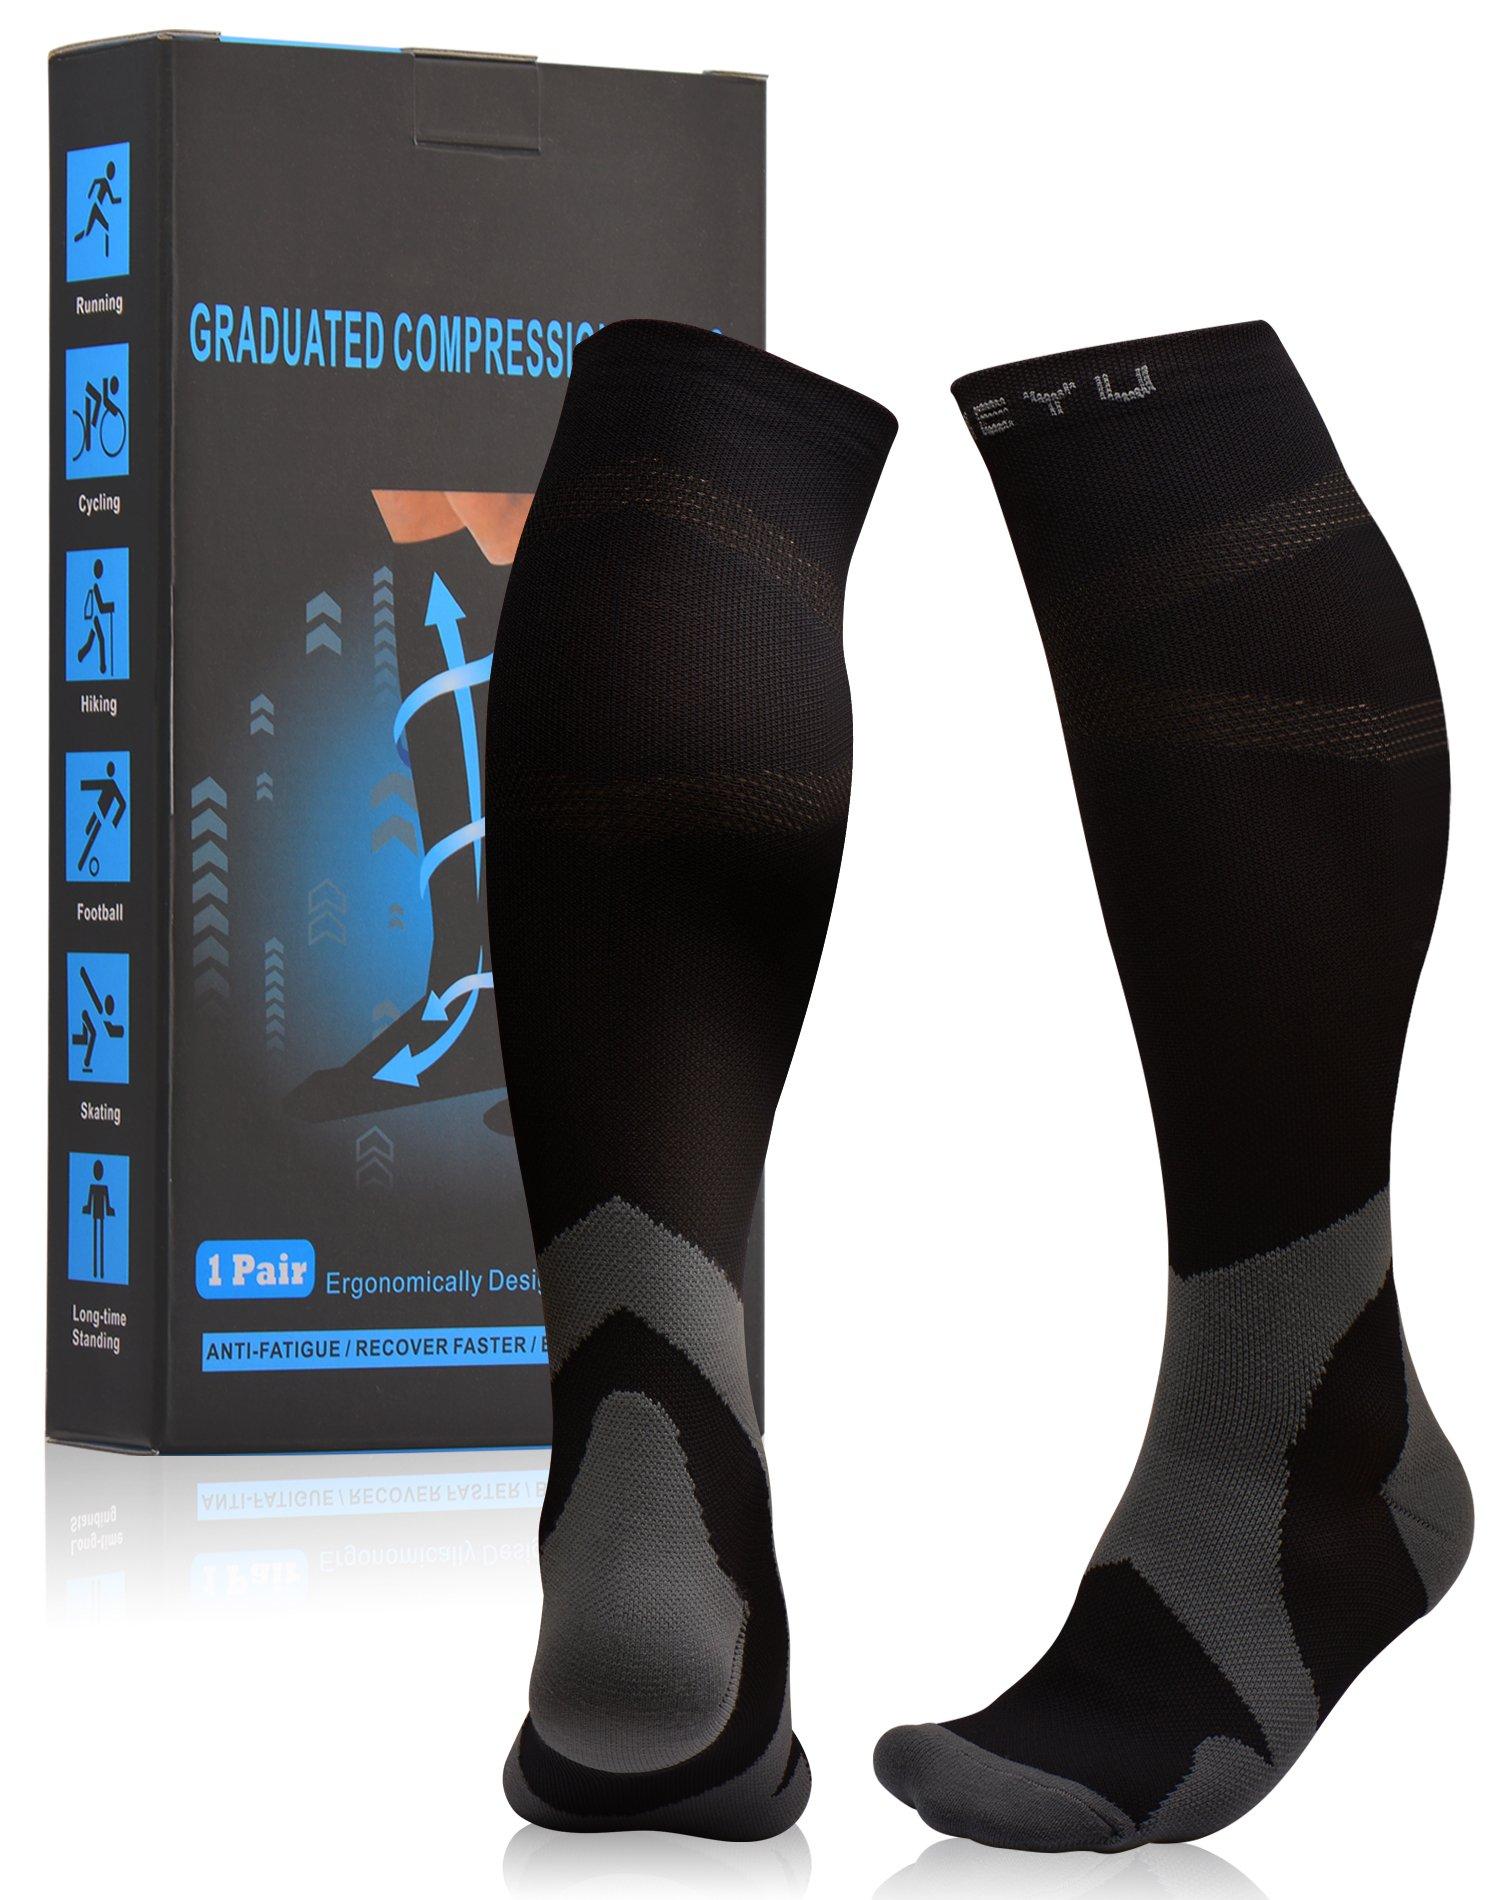 Atist Compression Socks for Women & Men, 20-30 mmHg, Crossfit, Boost Calf Muscle Performance & Stamina, Black, L/XL